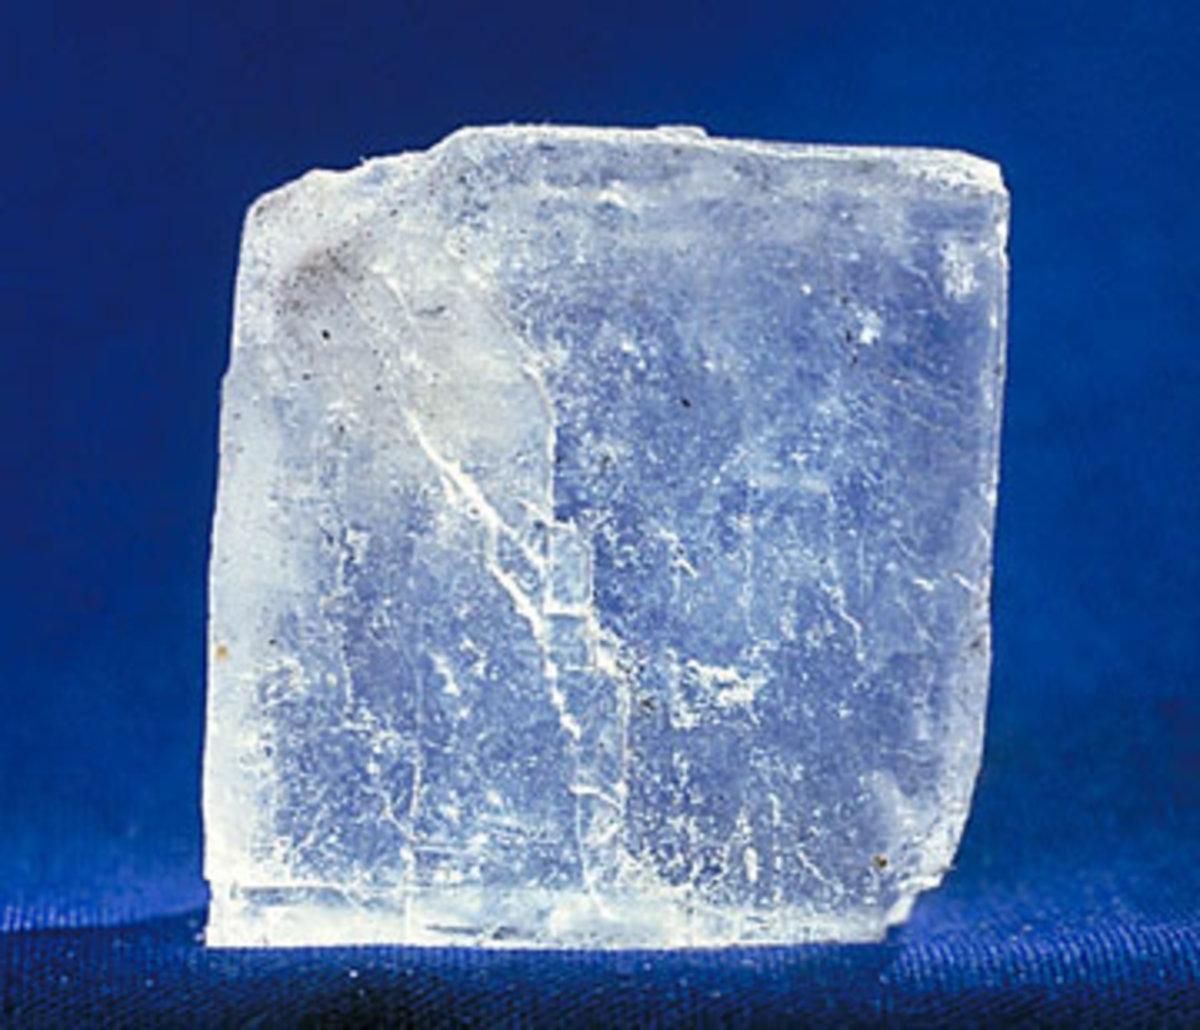 Salt granule.